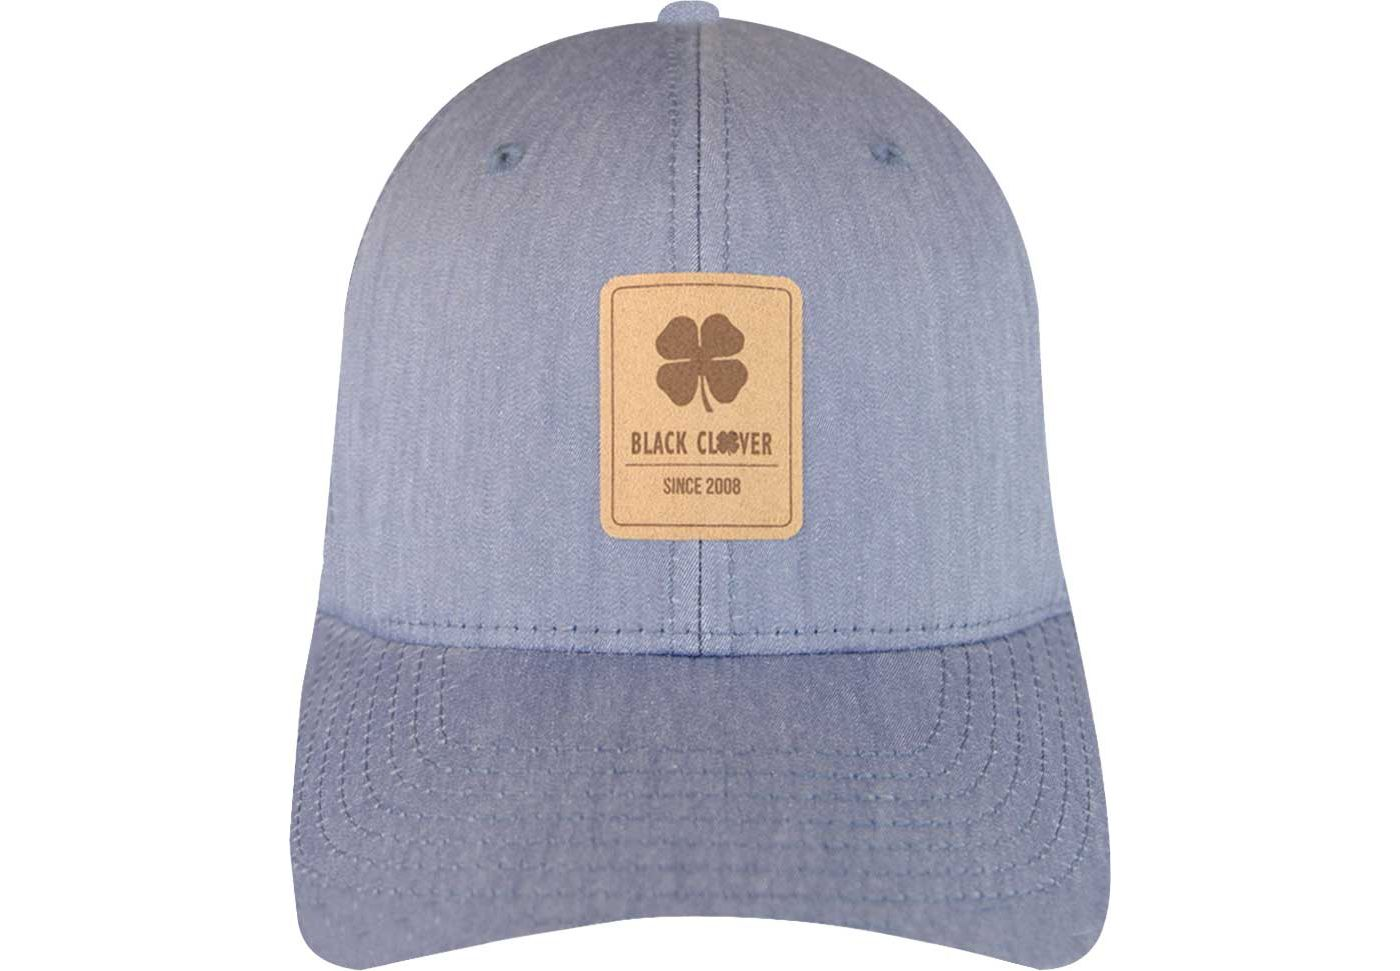 Black Clover Men's Suede Luck Golf Hat